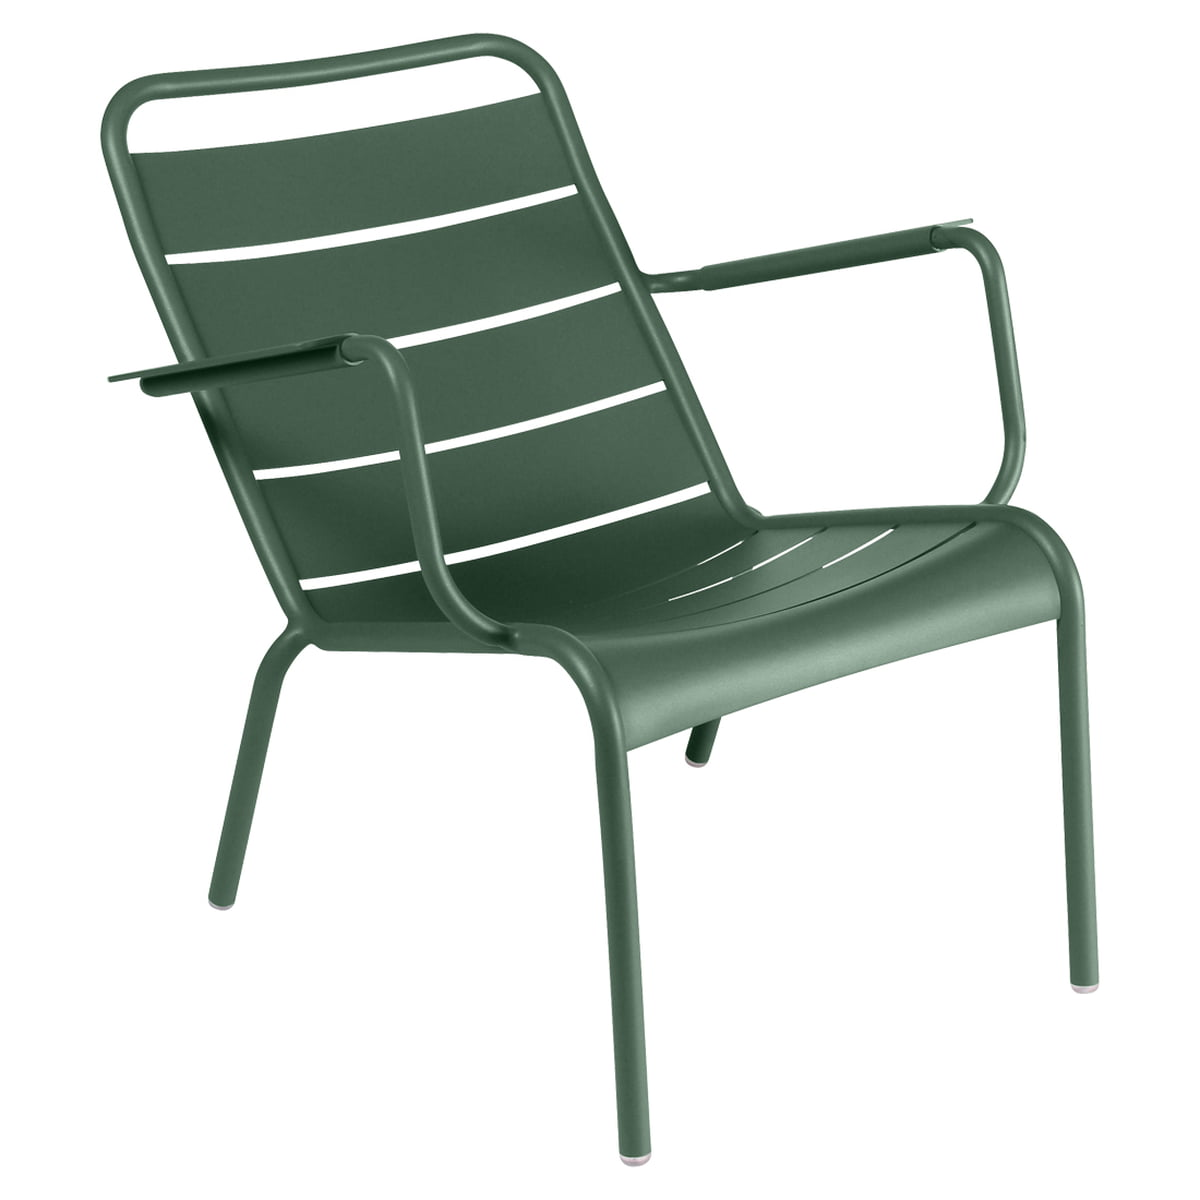 fauteuil bas luxembourg de fermob. Black Bedroom Furniture Sets. Home Design Ideas